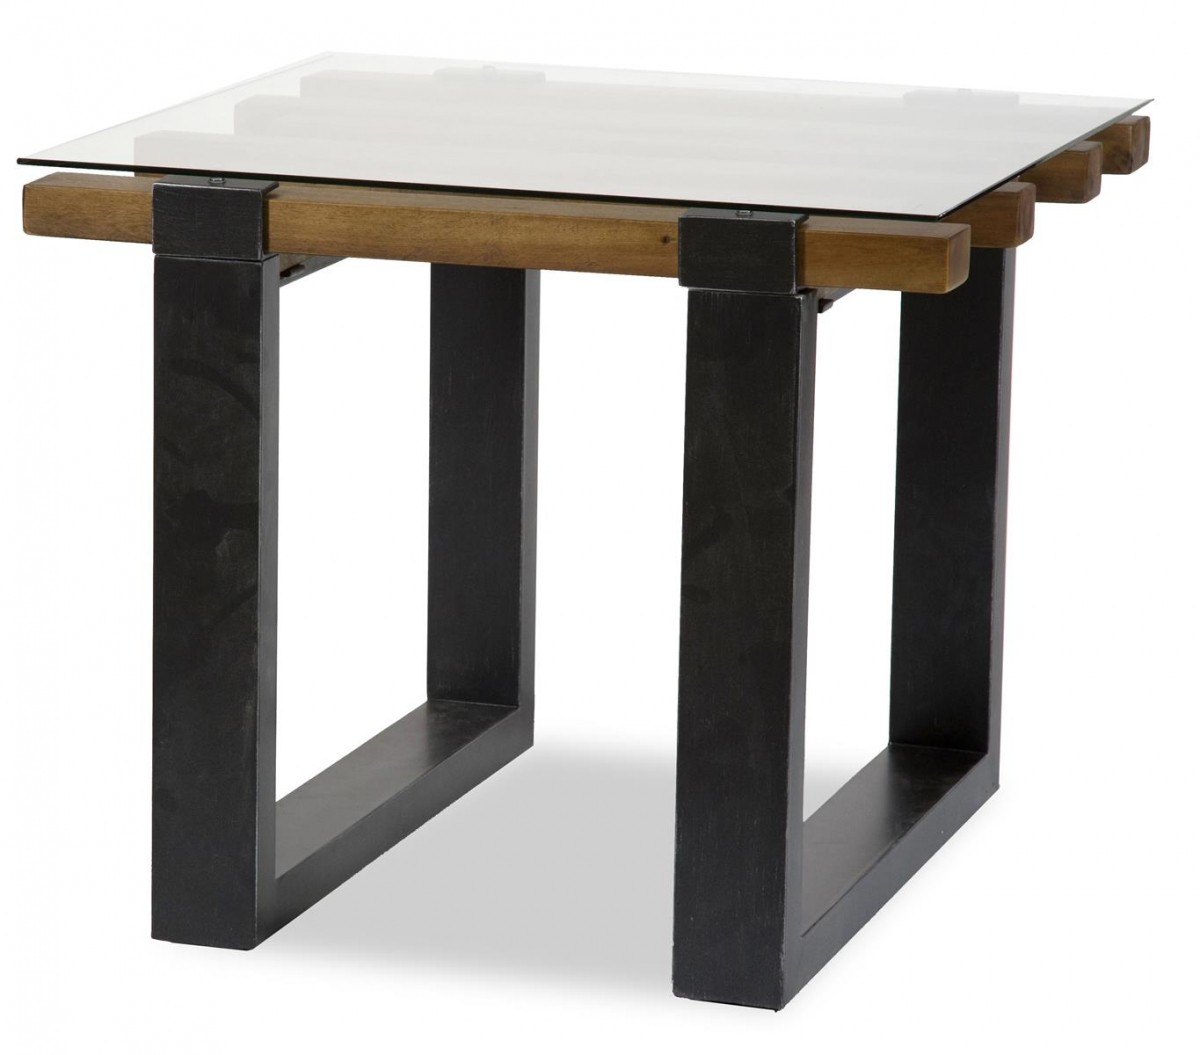 AICO Freestanding Keystone End Table FS-KYSTN202